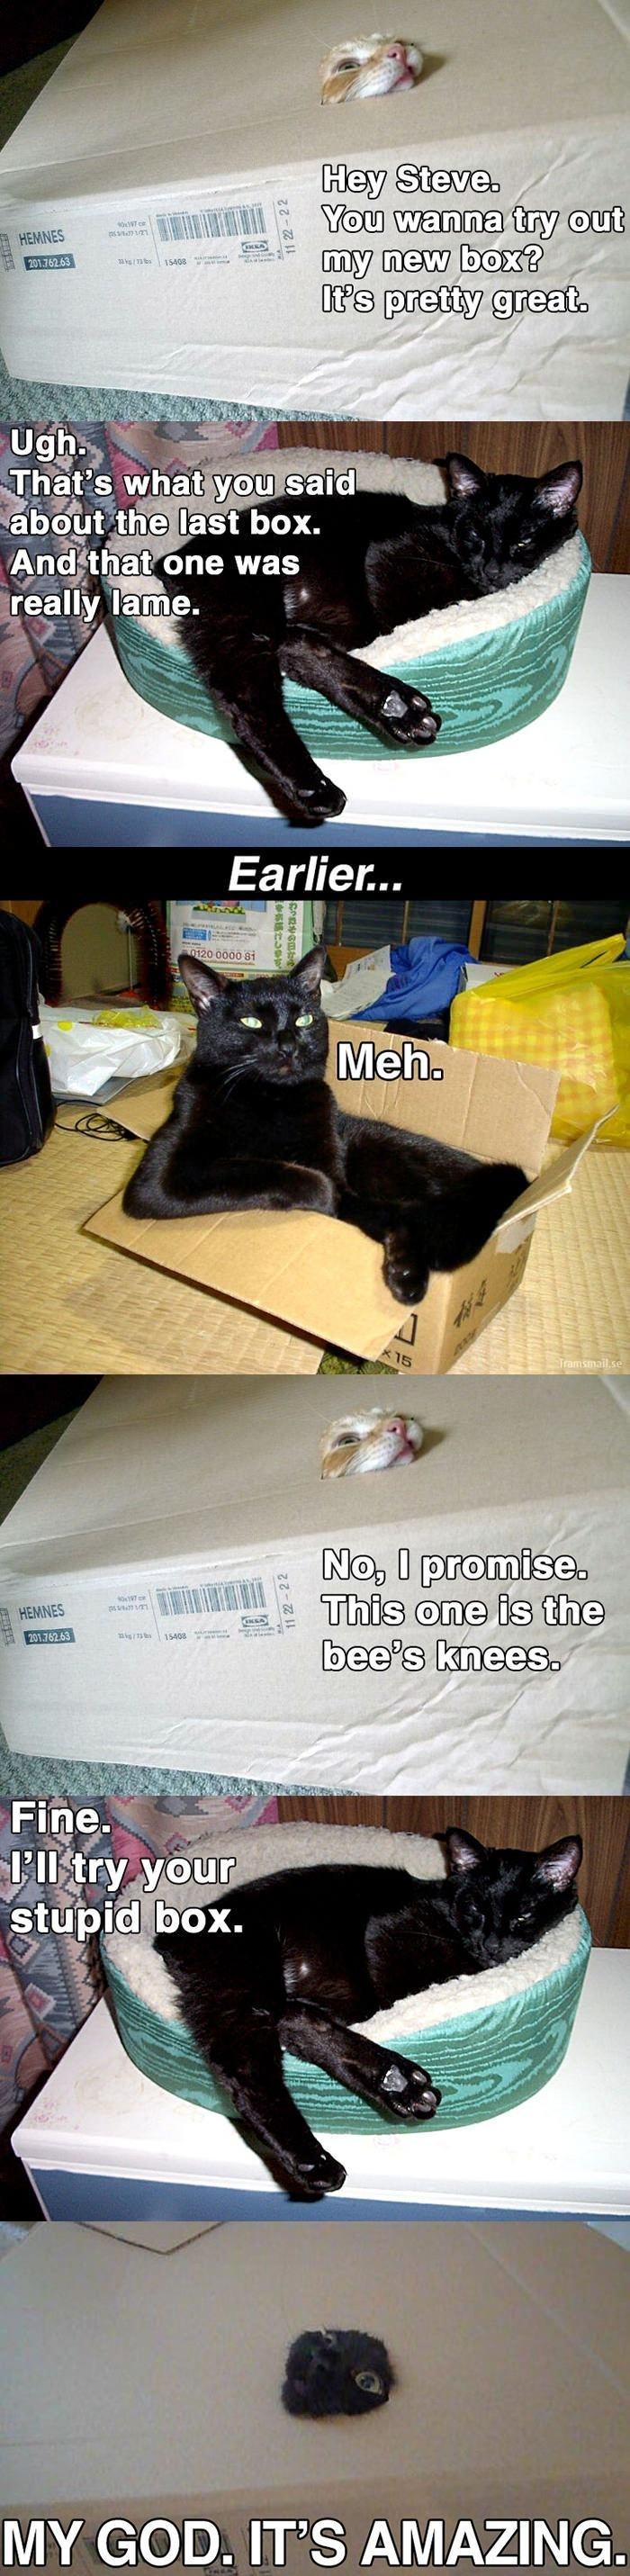 Wanna try my new box?